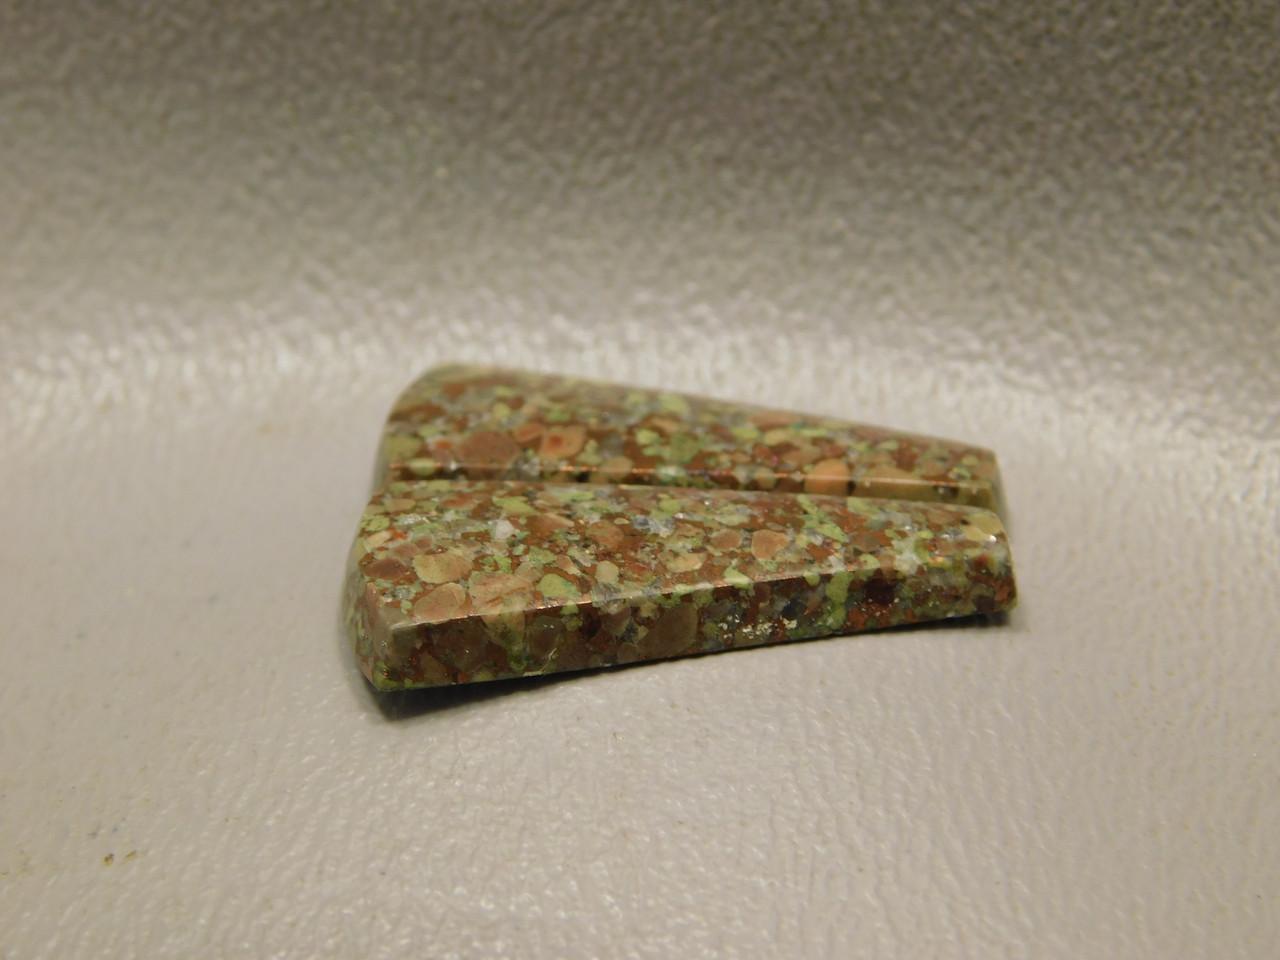 Copper Rose Semi Precious Stones Matched Pair Cabochons #7